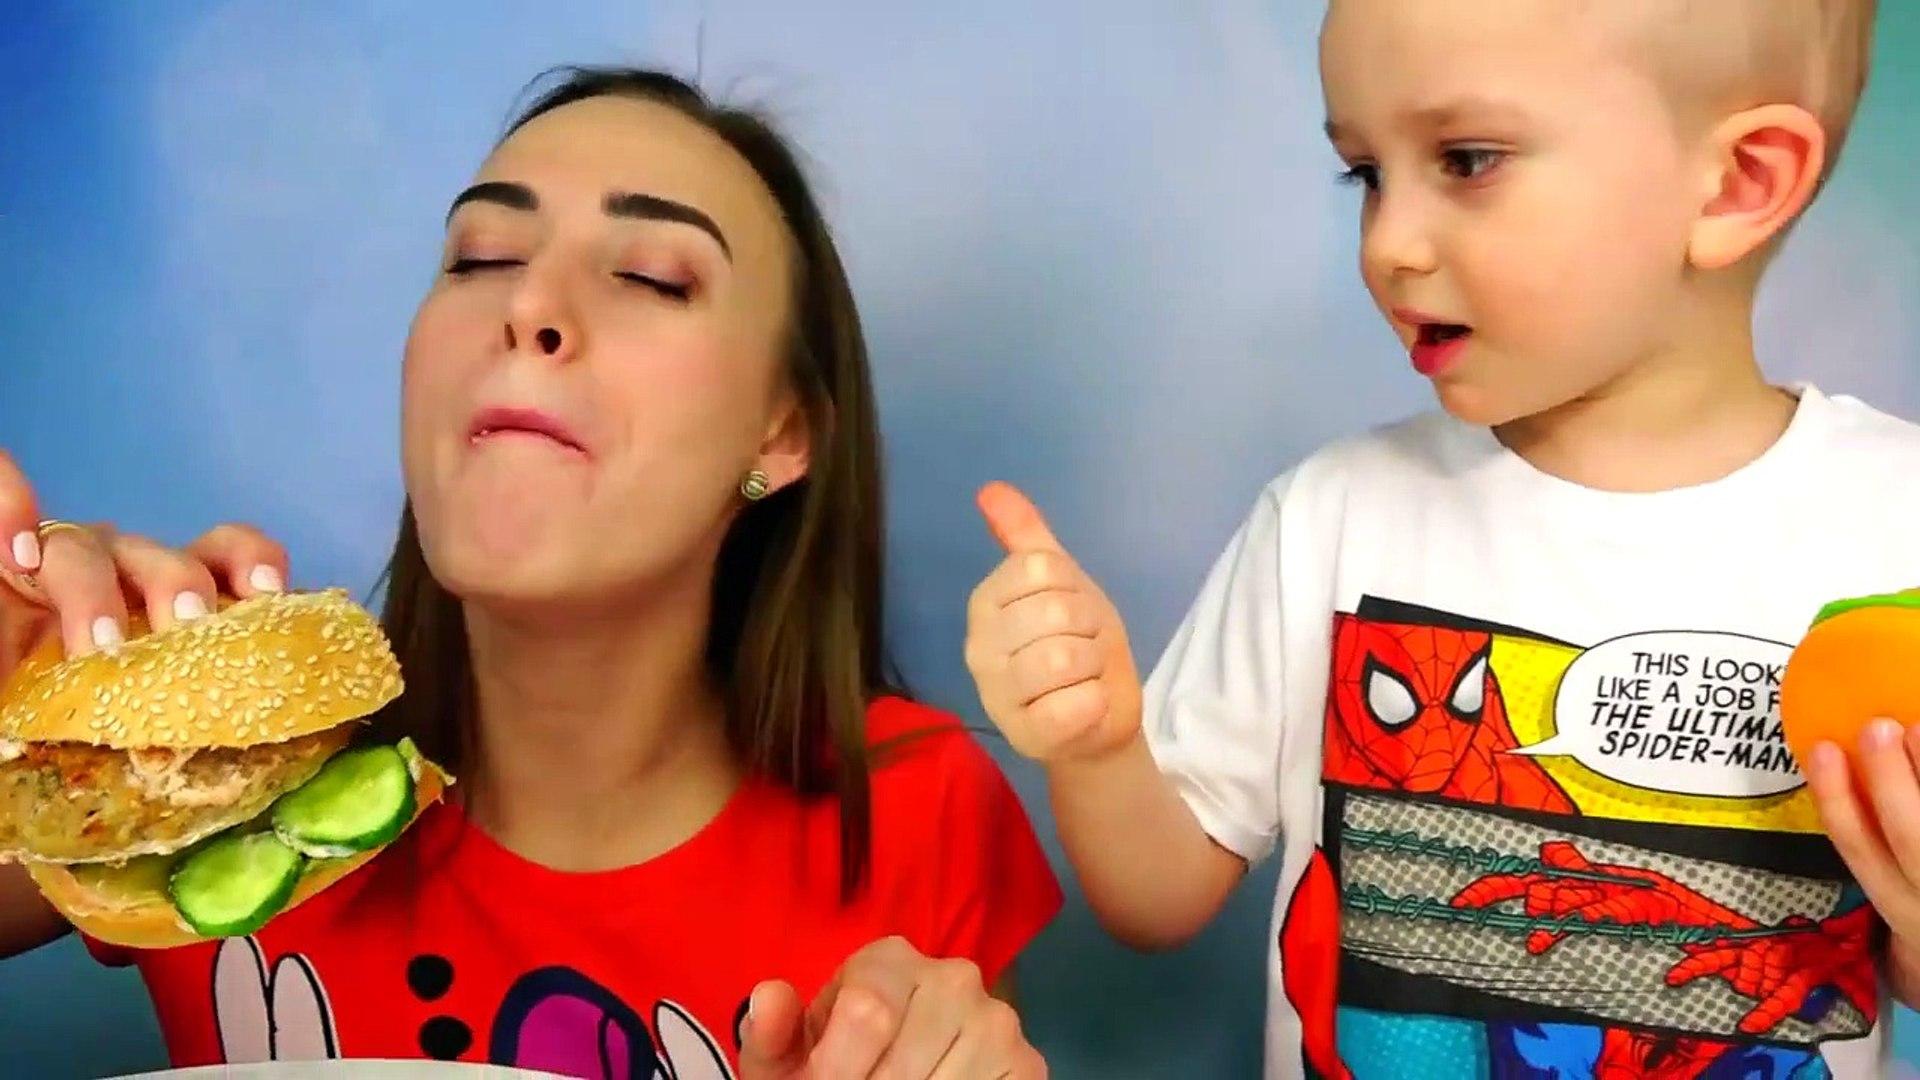 Обычная Еда или Мармелад؟ Челлендж !! Giant Spider vs Gummy Spider Food Candy Challenge